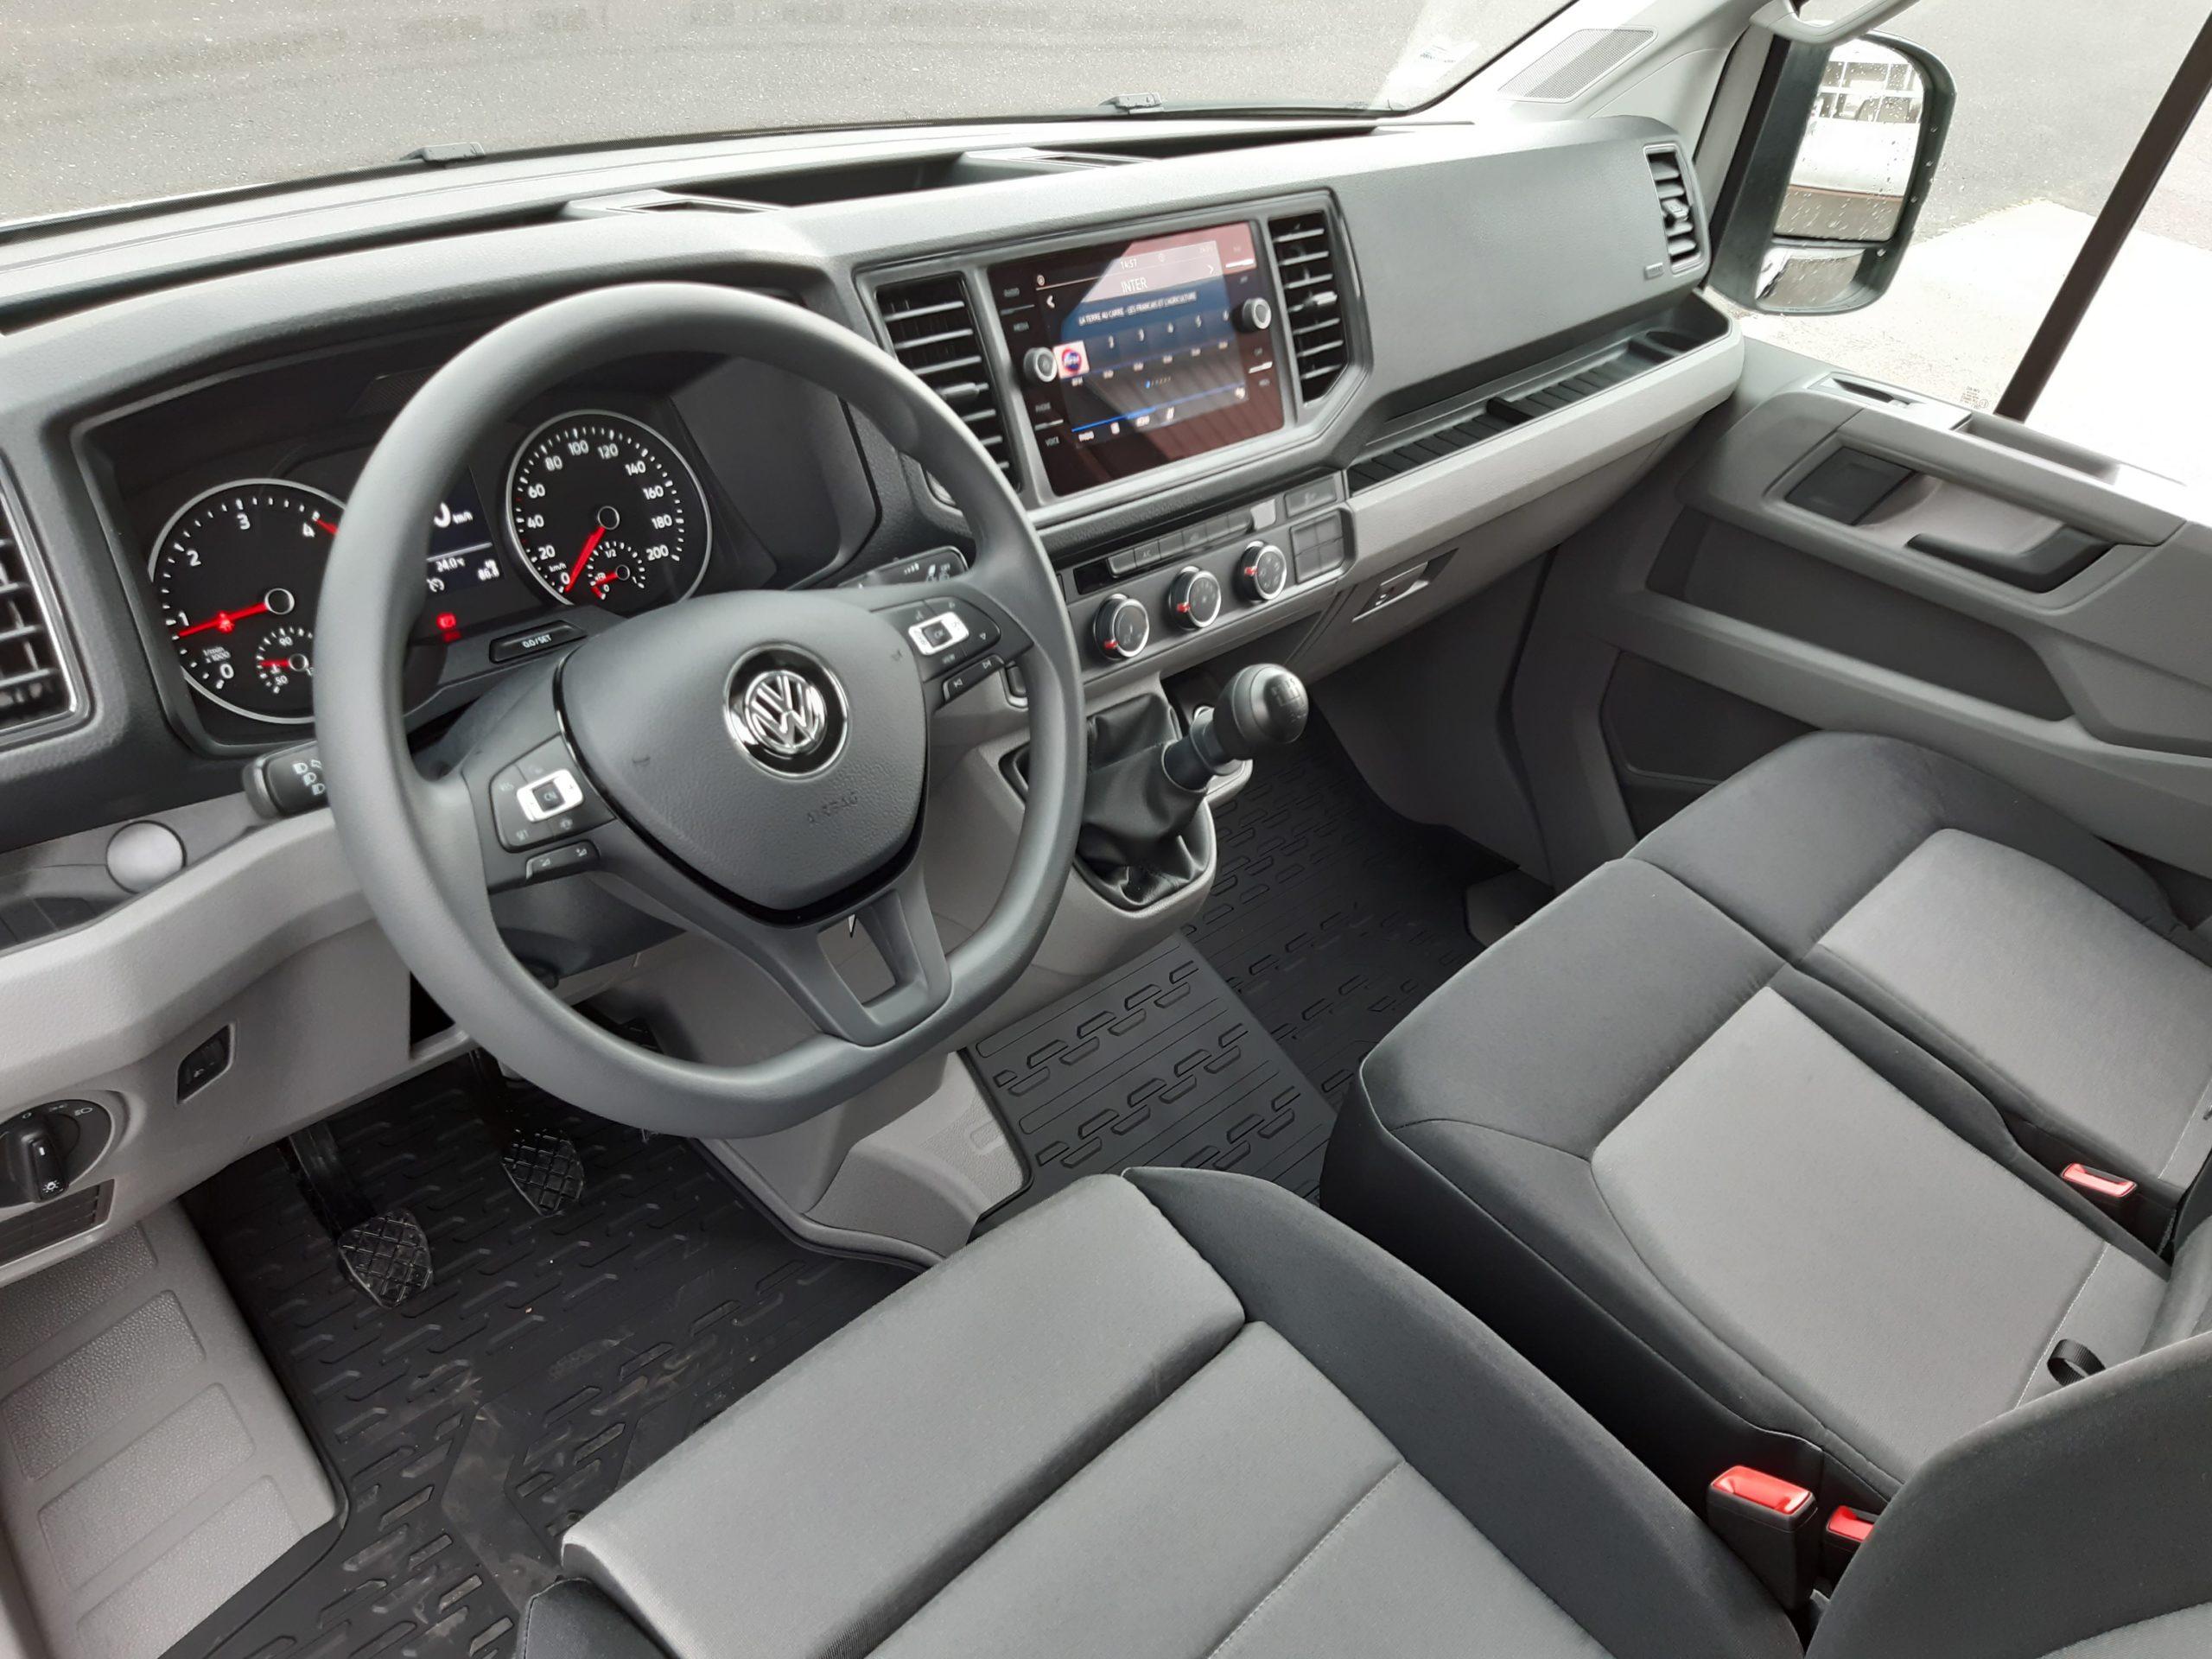 Location d'un utilitaire benne - Volkswagen Crafter benne et coffre - Vue9